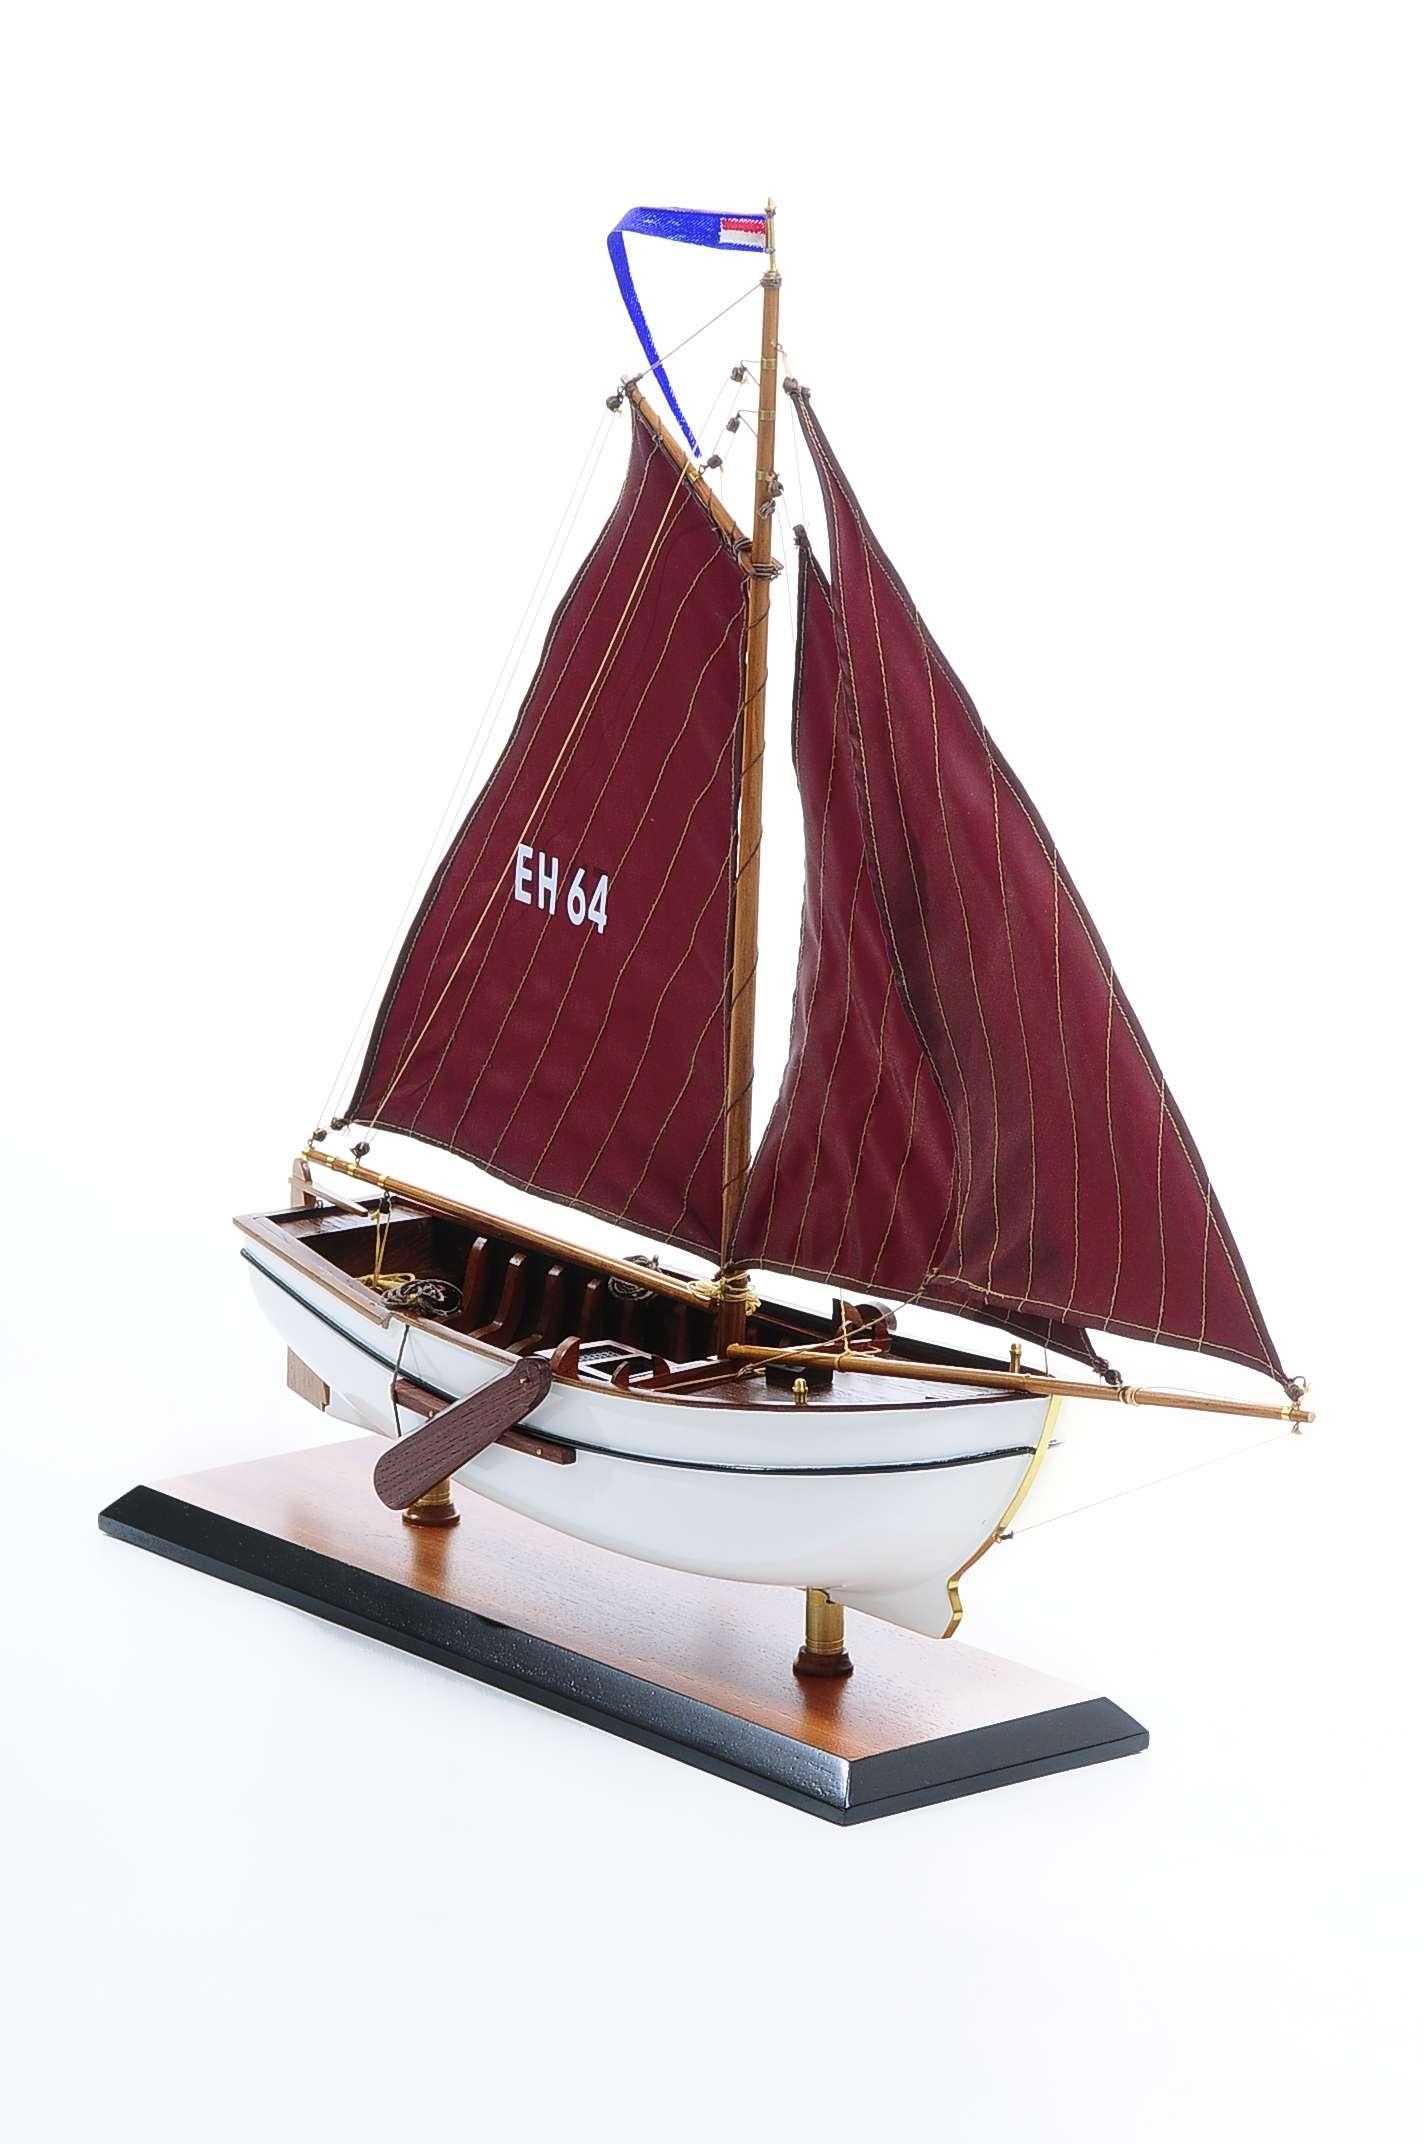 1432-4571-Dutch-Marker-Roundbow-Model-Boat